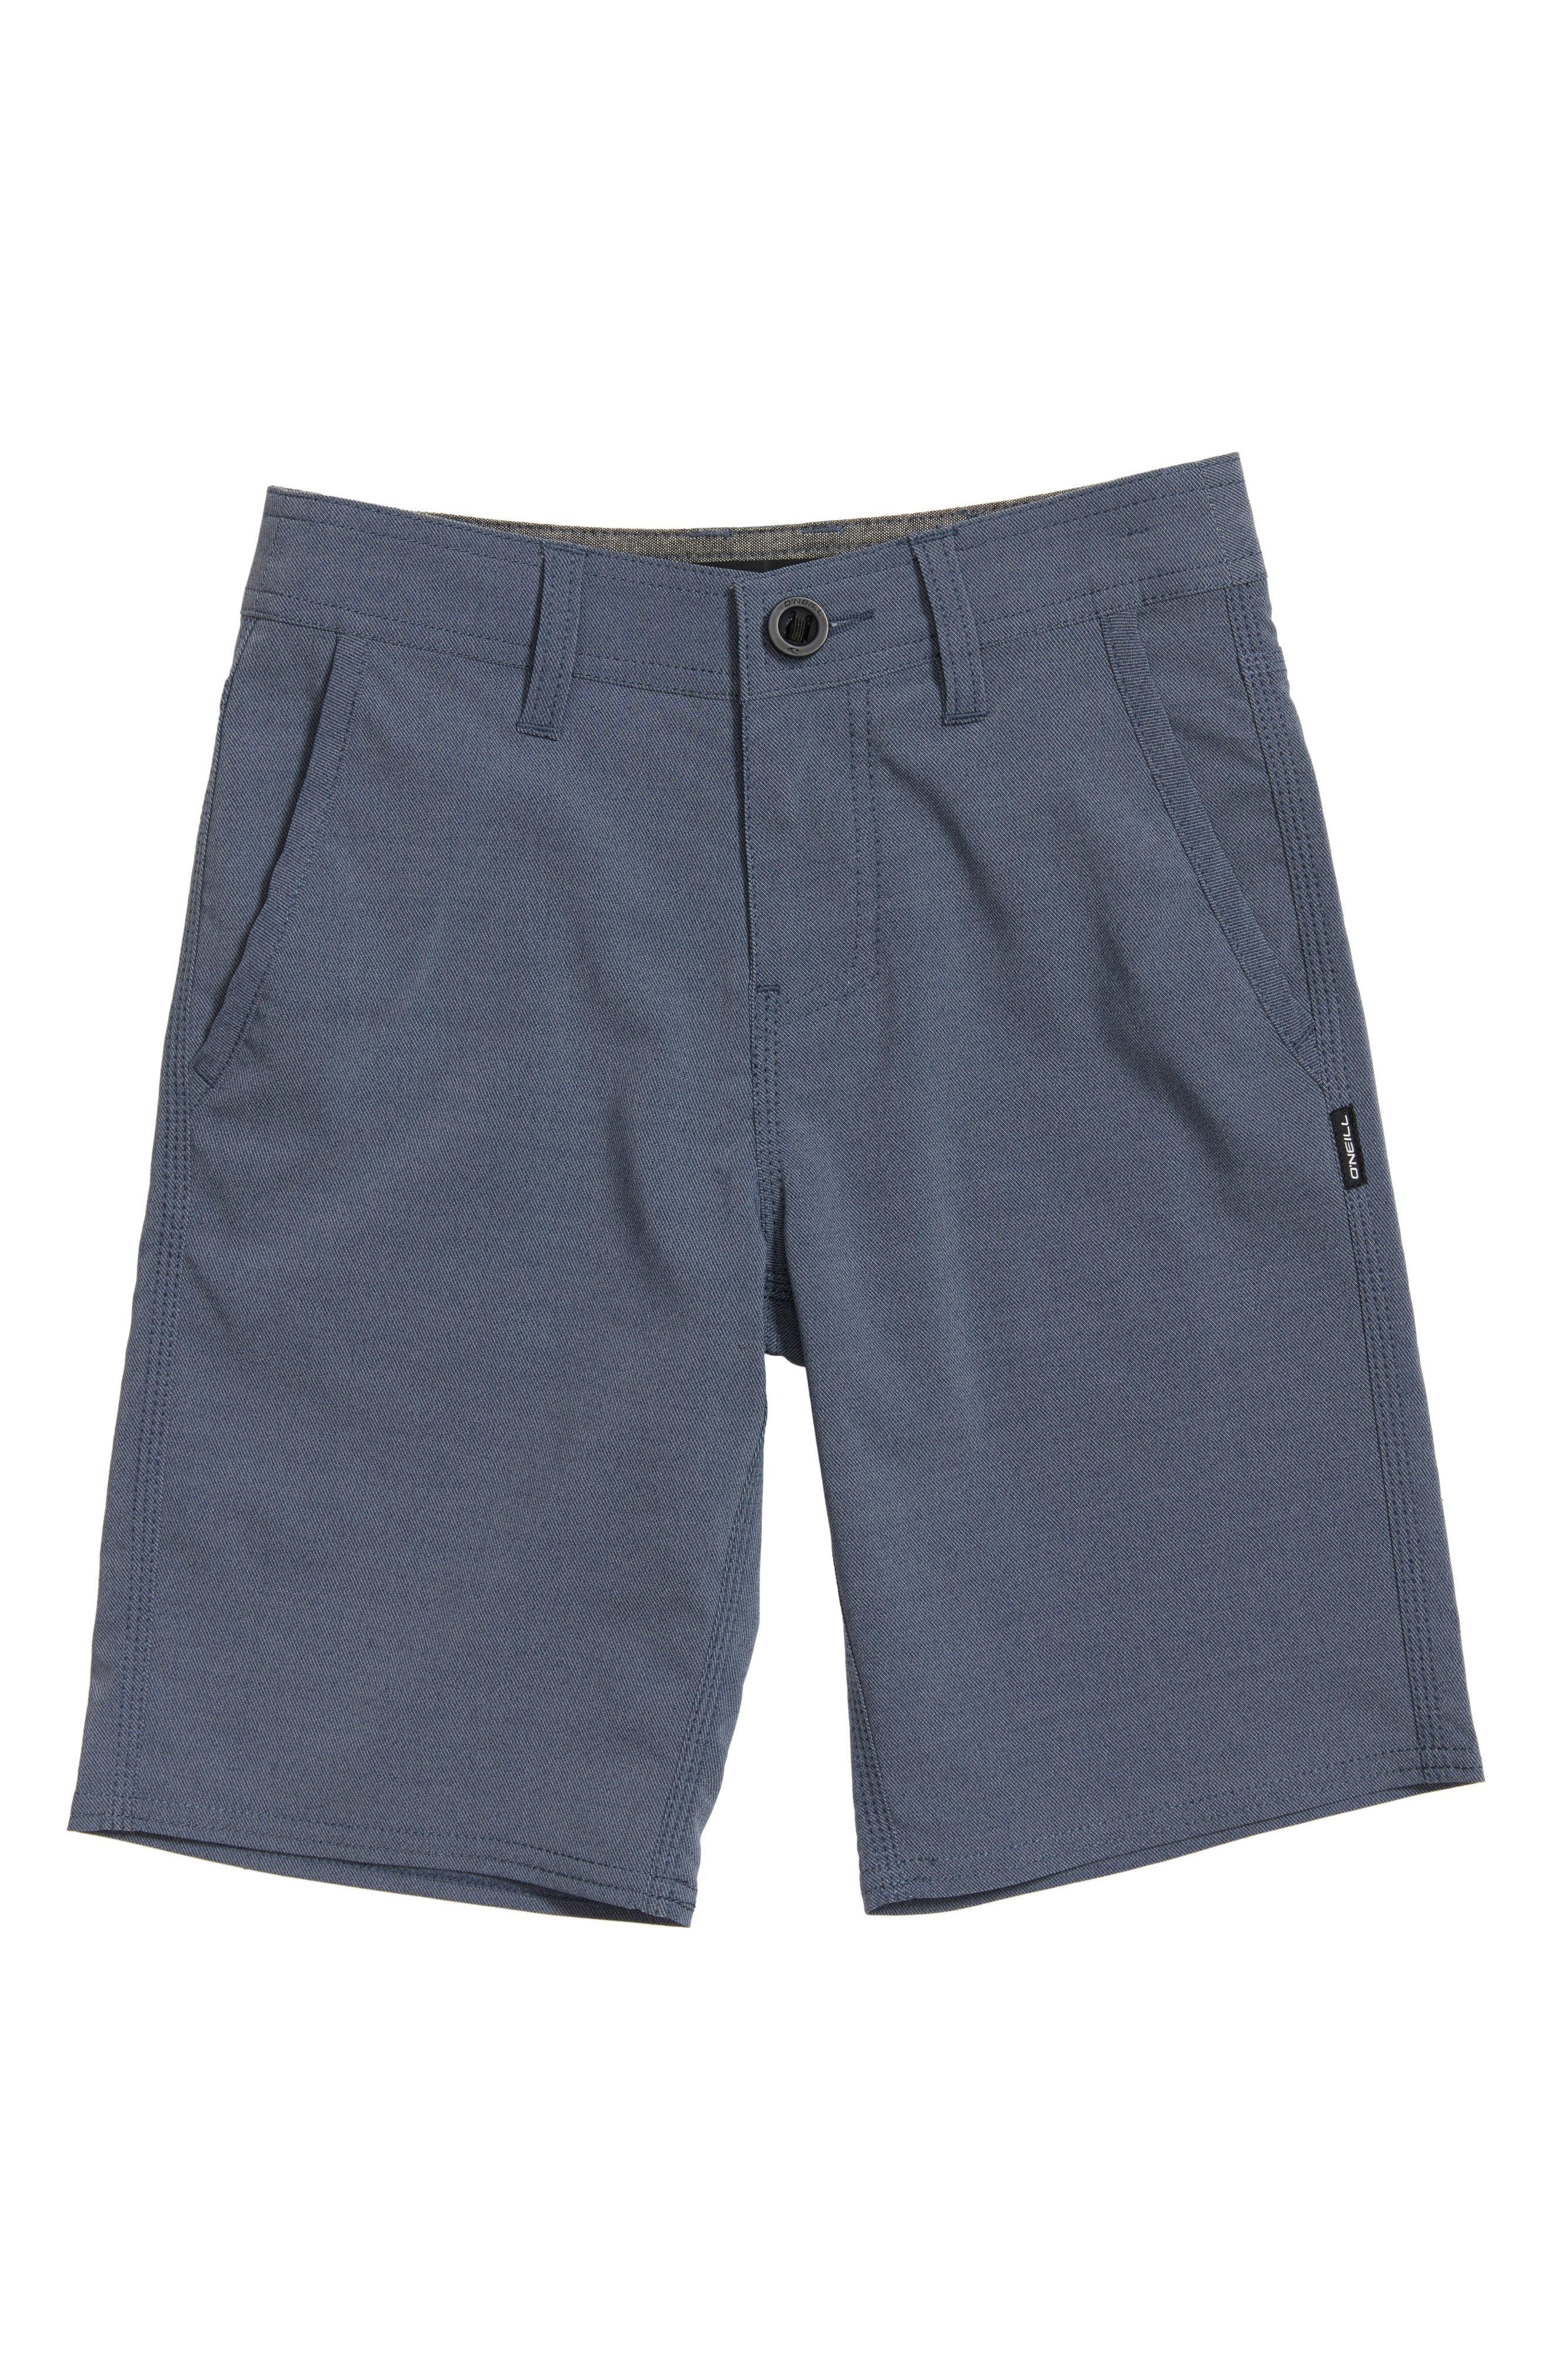 Stockton Hybrid Shorts,                             Main thumbnail 1, color,                             Navy